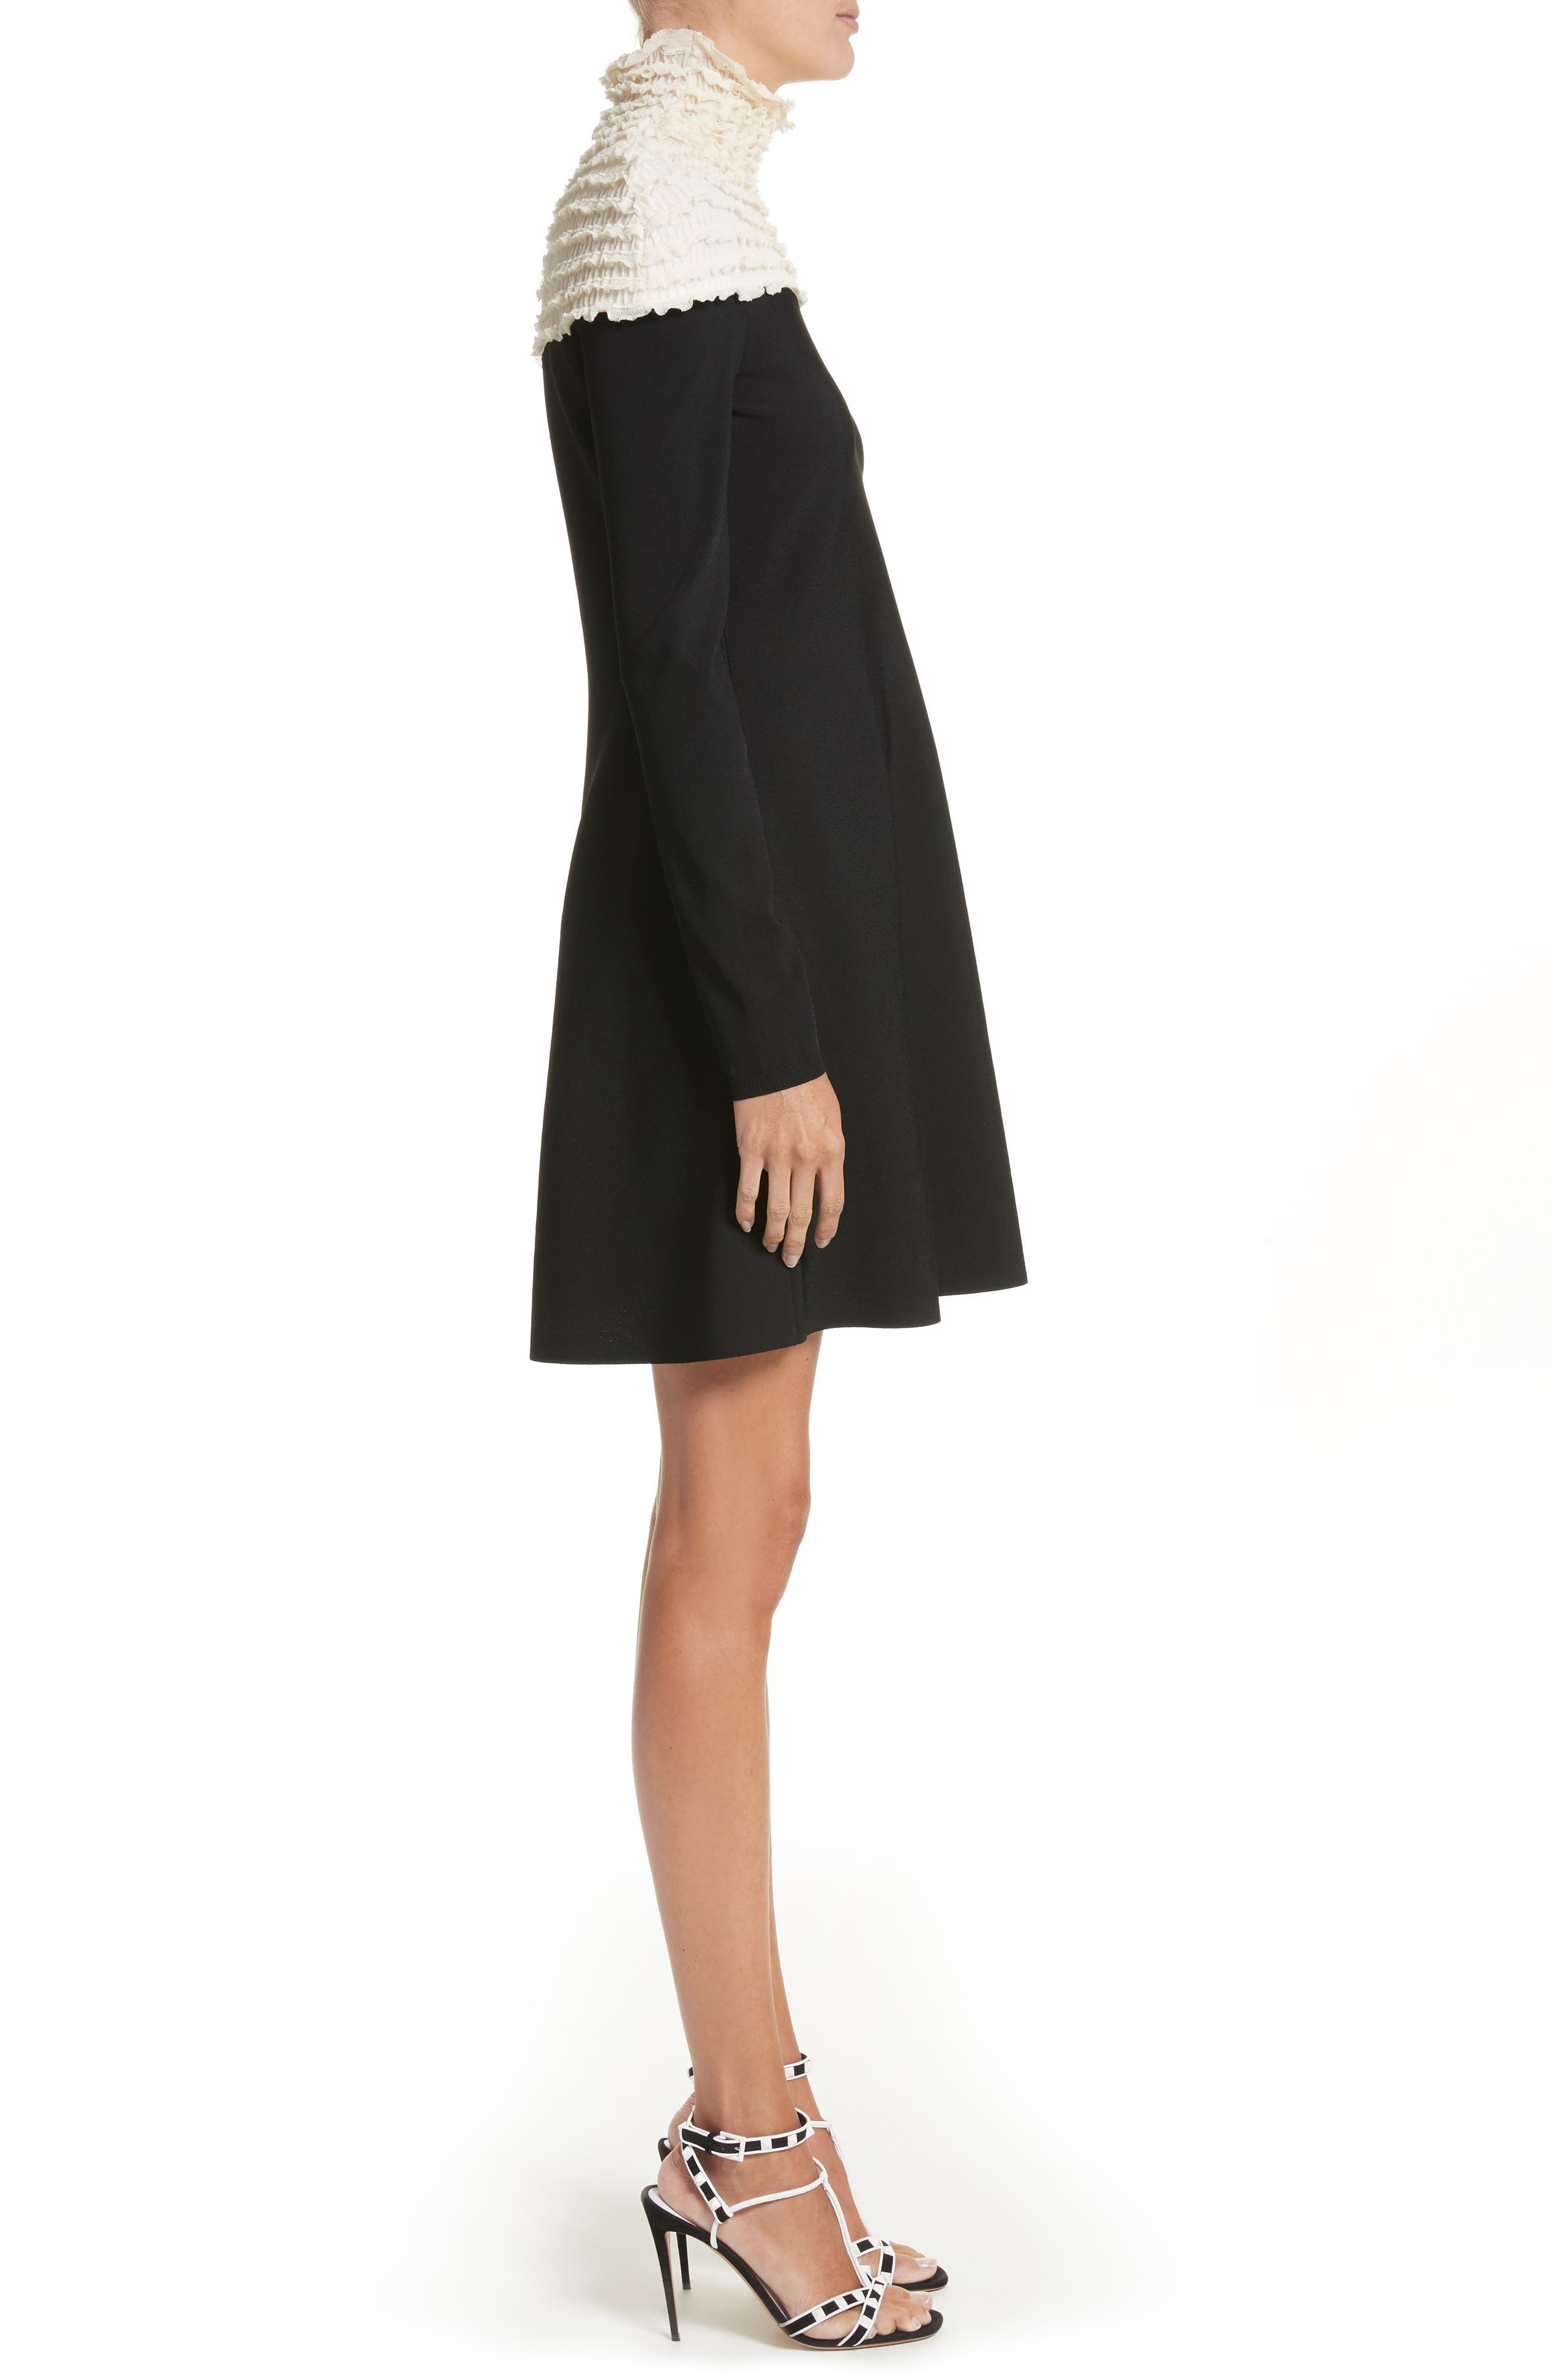 Ruffle Neckline Knit Dress,                             Alternate thumbnail 3, color,                             Black/ Ivory